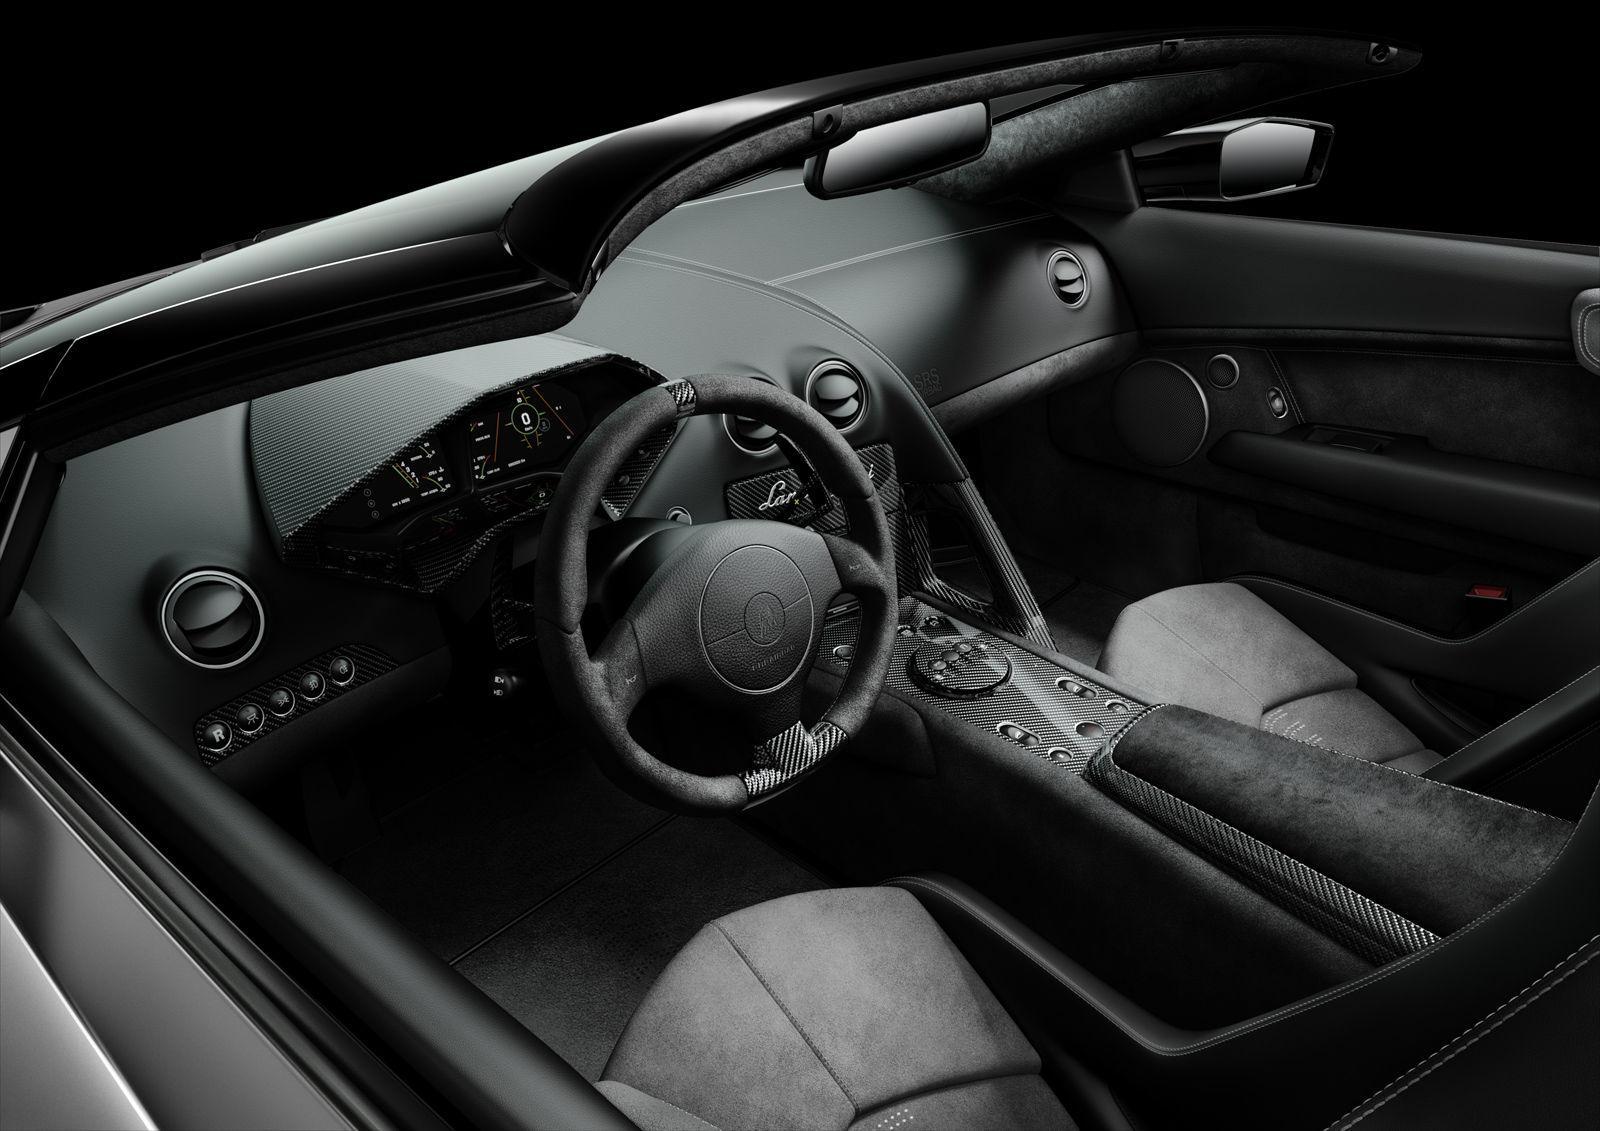 Ausfuhrliche Modellbeschreibung Uber Den Lamborghini Reventon Roadster